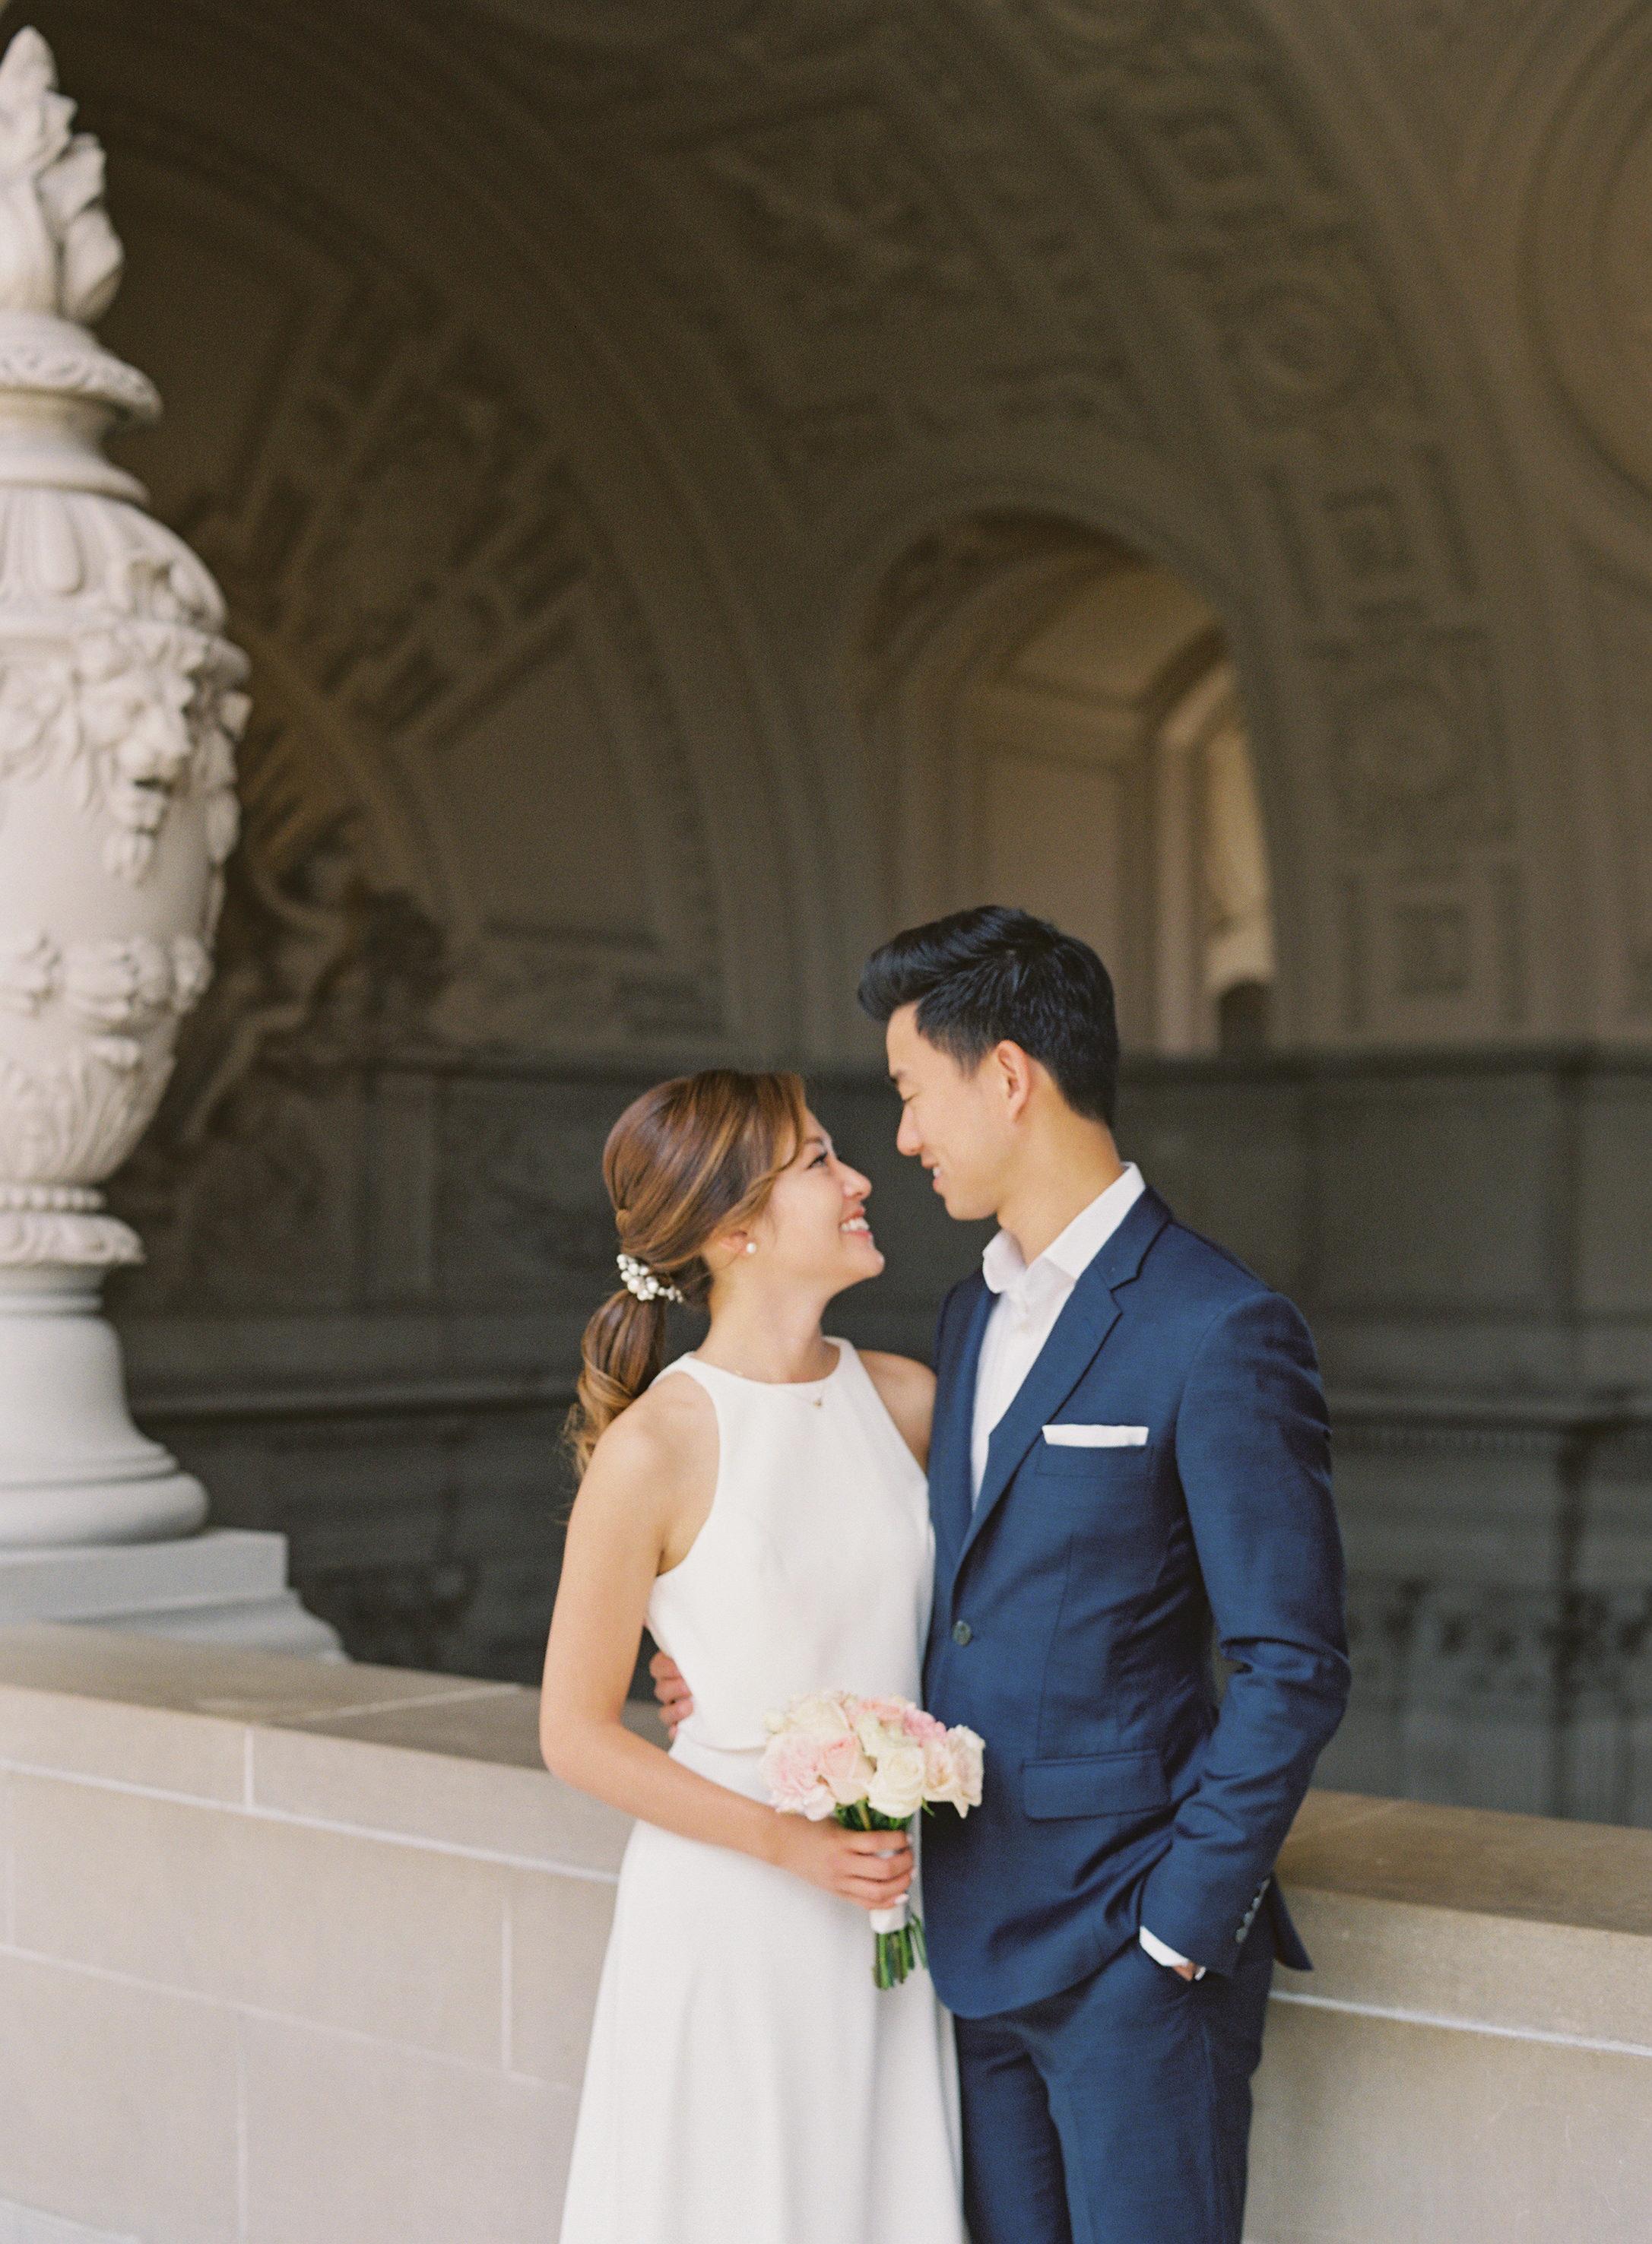 San-francisco-city-hall-photography-wedding-029.jpg